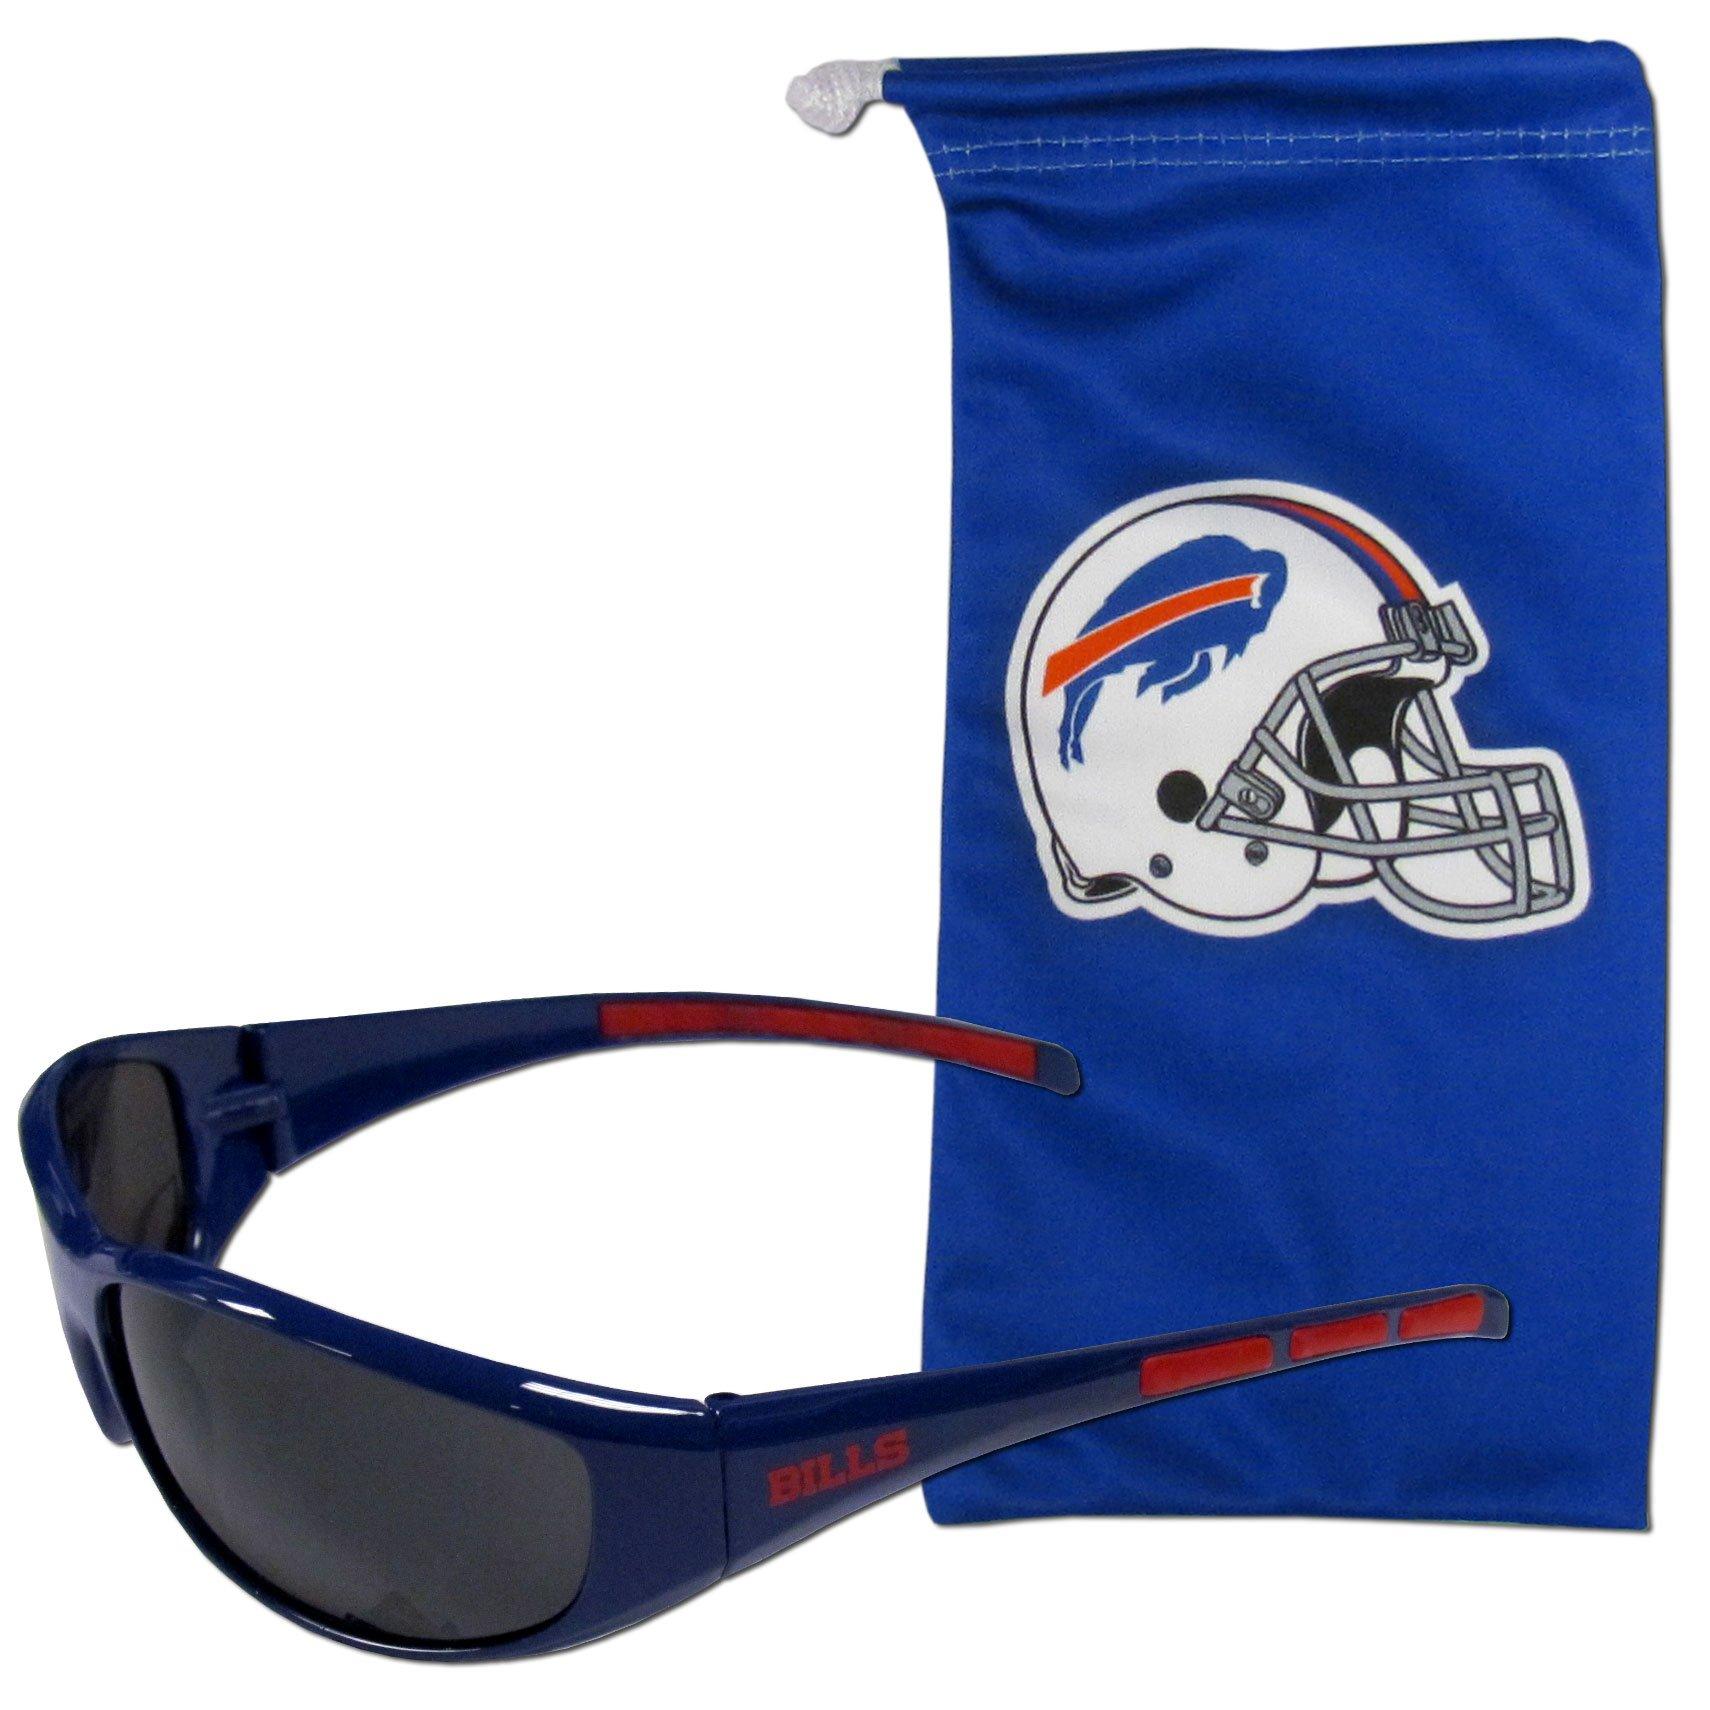 NFL Buffalo Bills Adult Sunglass and Bag Set, Blue